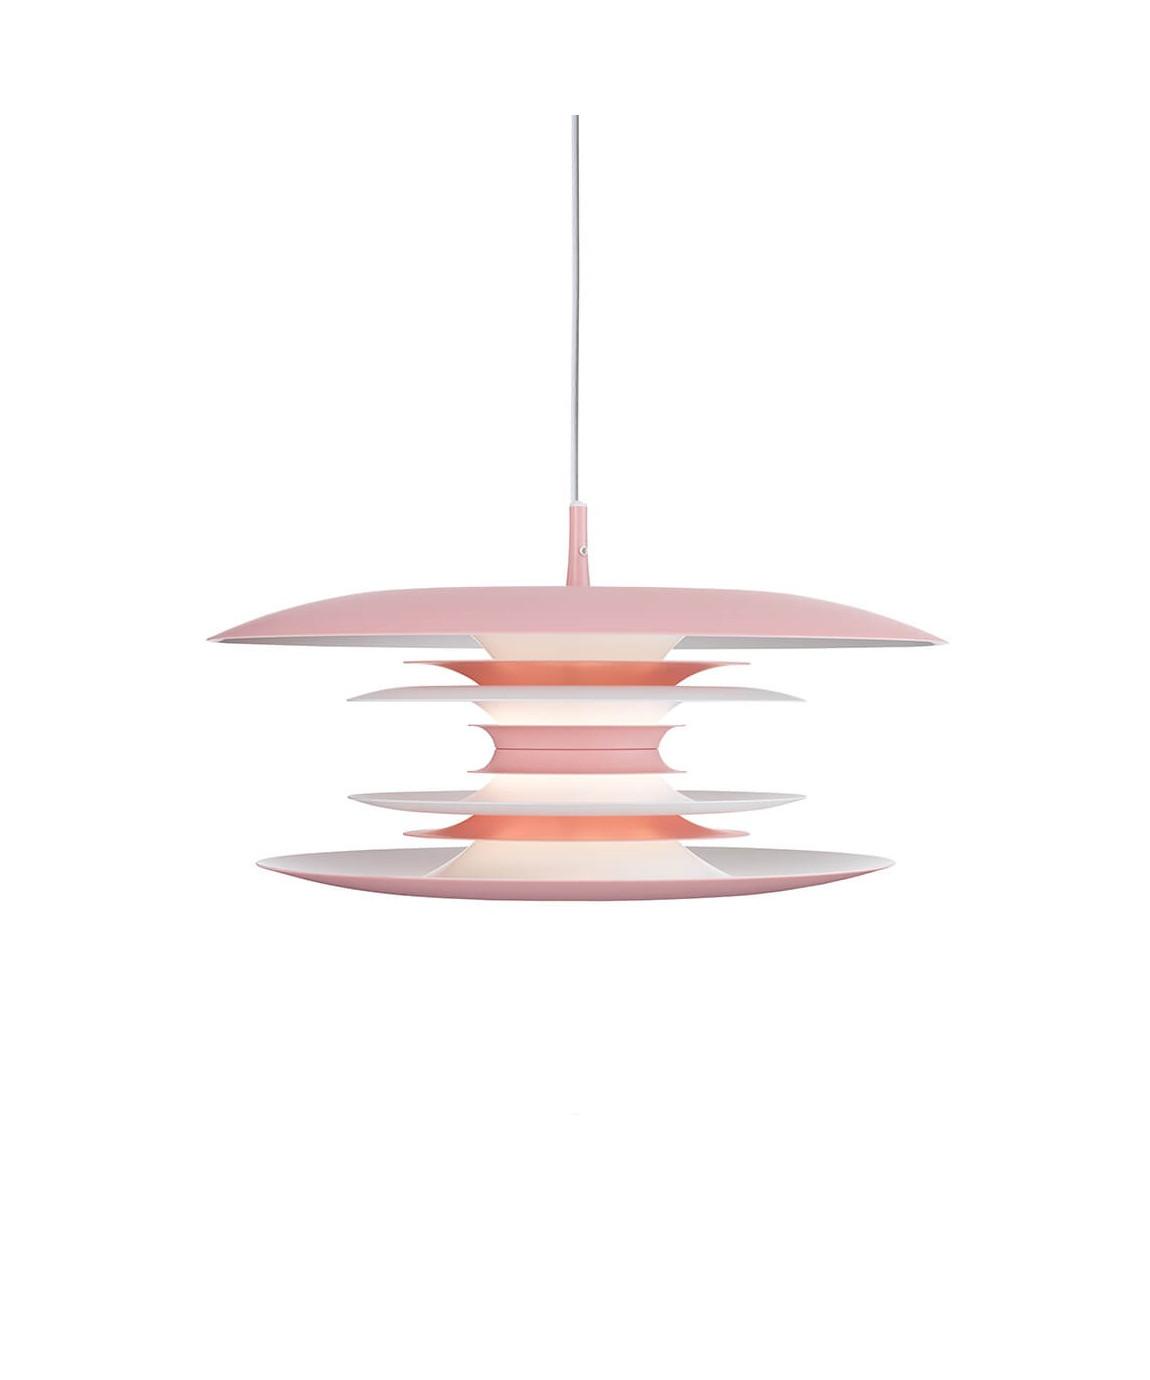 Belid Diablo Riippuvalaisin LED Ø400 Vaaleanpunainen - Belid